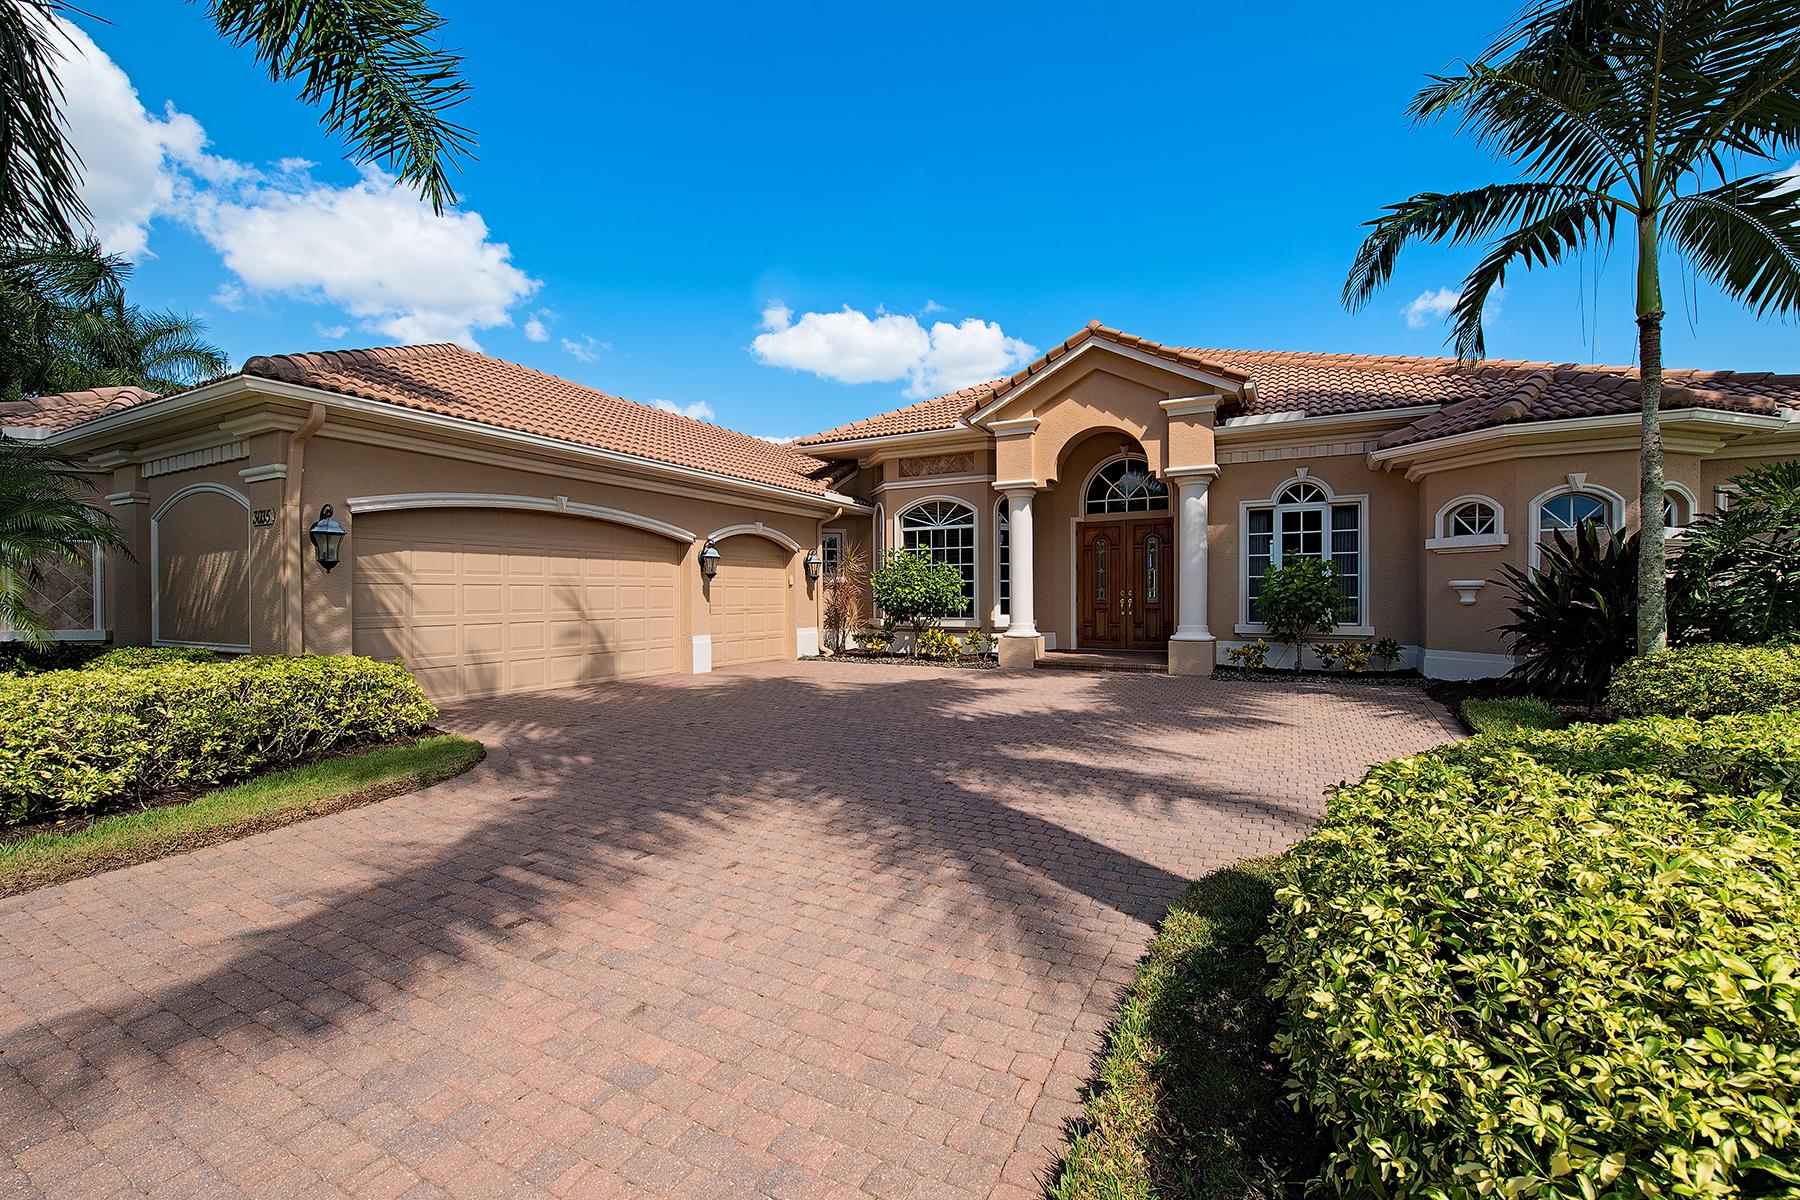 Single Family Home for Sale at OLDE CYPRESS - DA VINCI ESTATES 3035 Mona Lisa Blvd Naples, Florida, 34119 United States